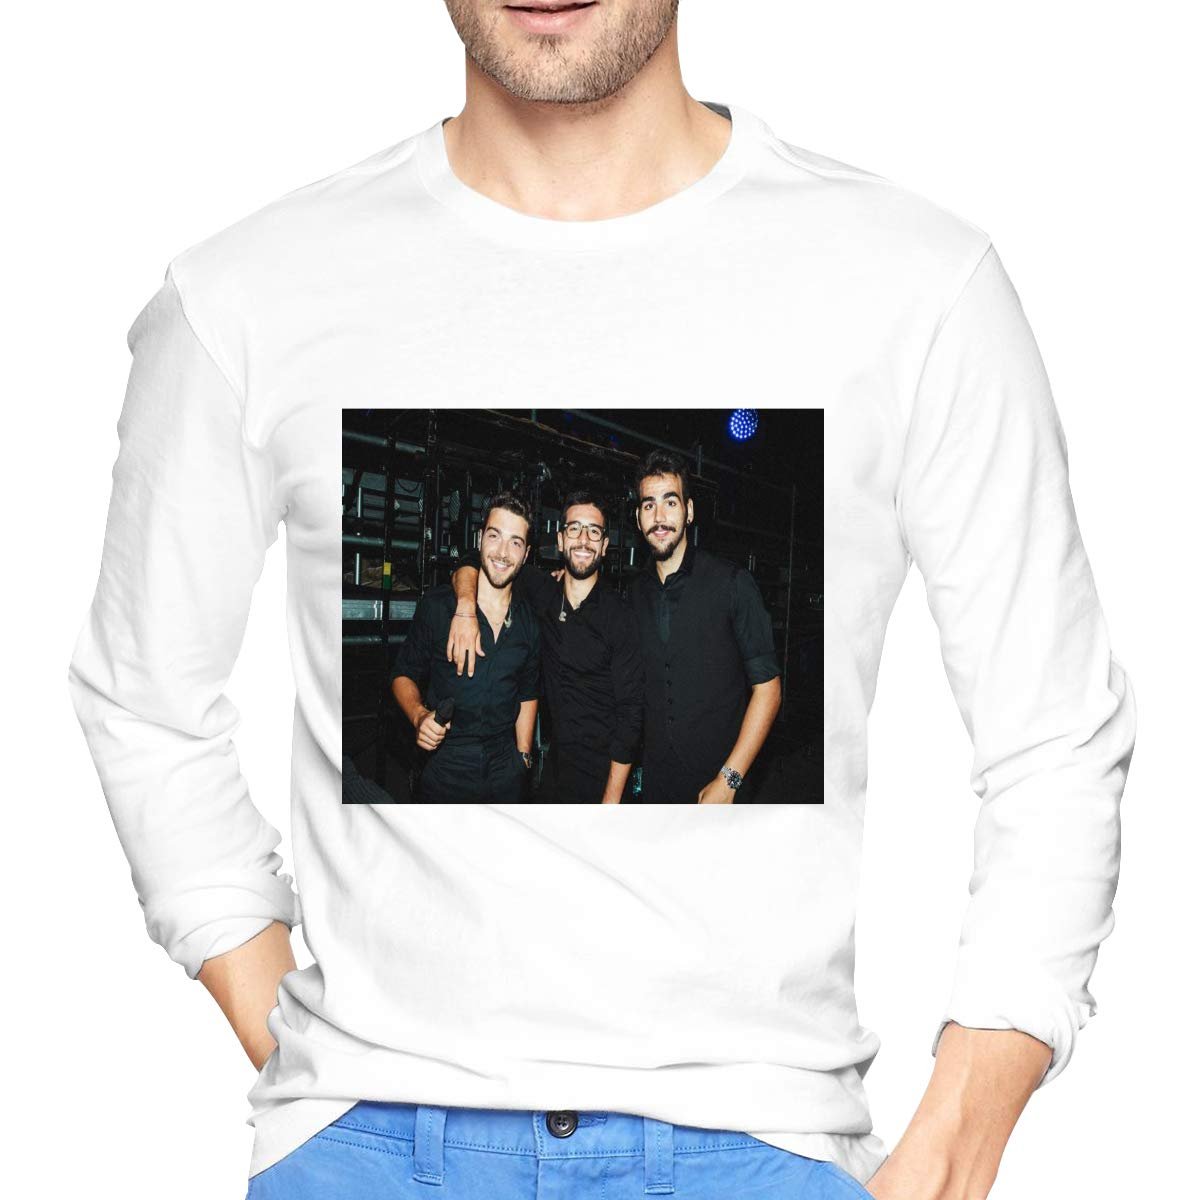 Lihehen Il Volo Retro Printing Round Neck T Shirts